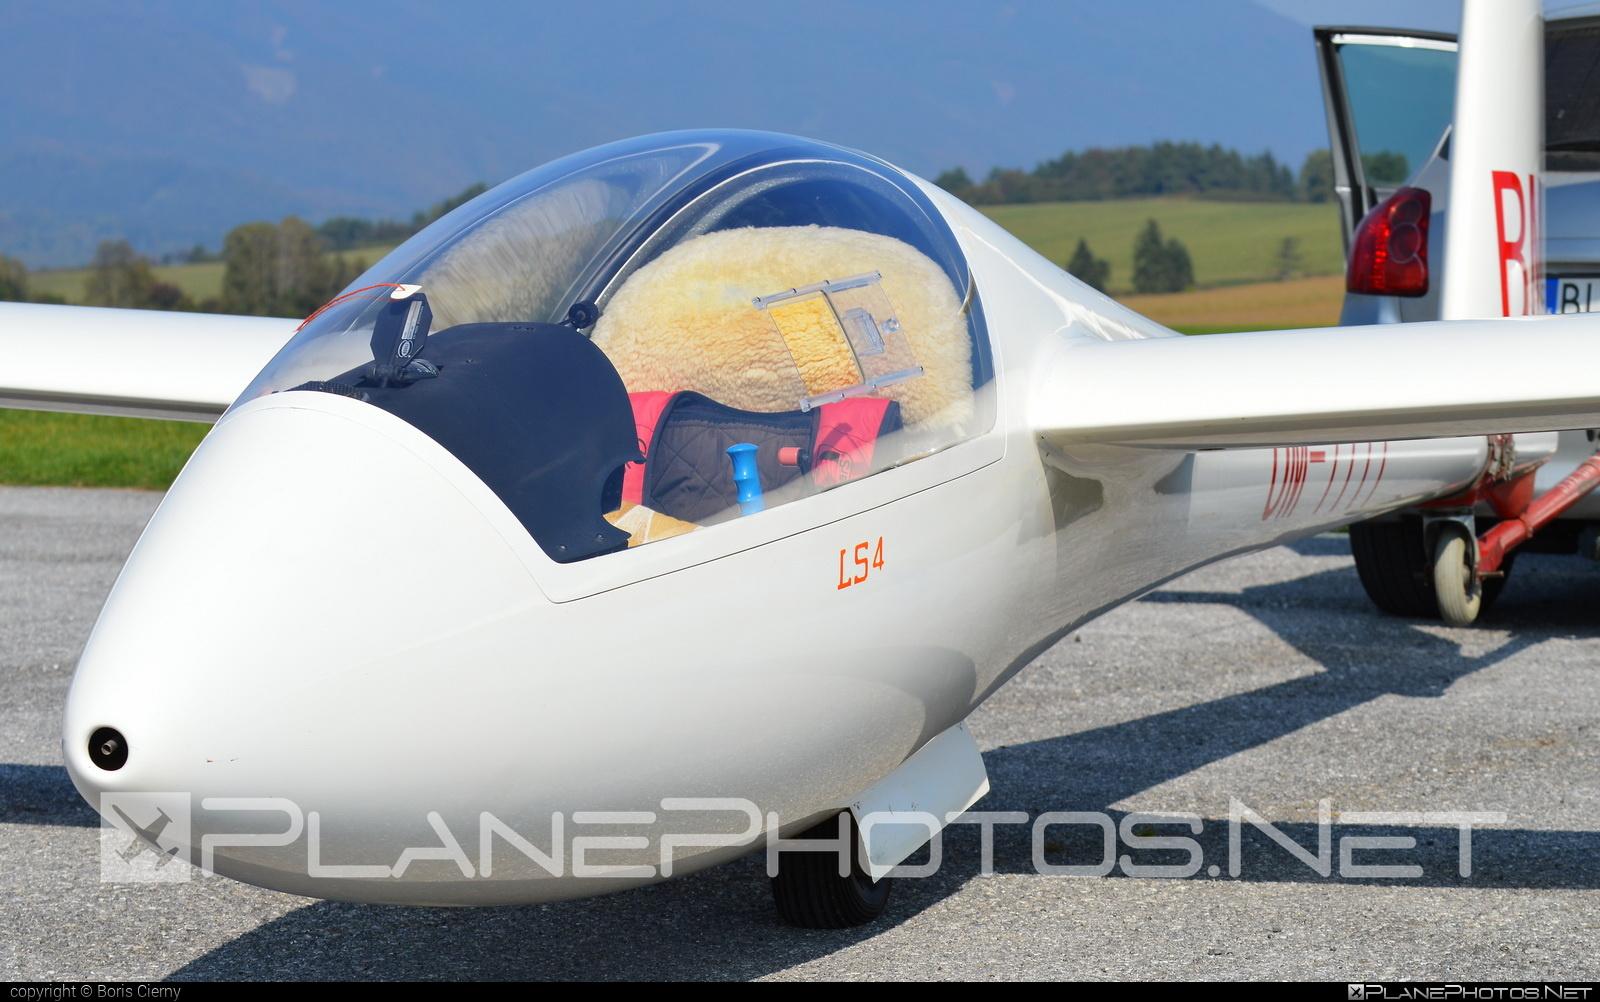 Slovenský národný aeroklub (Slovak National Aeroclub) Rolladen-Schneider LS4 - OM-7777 #rolladenschneider